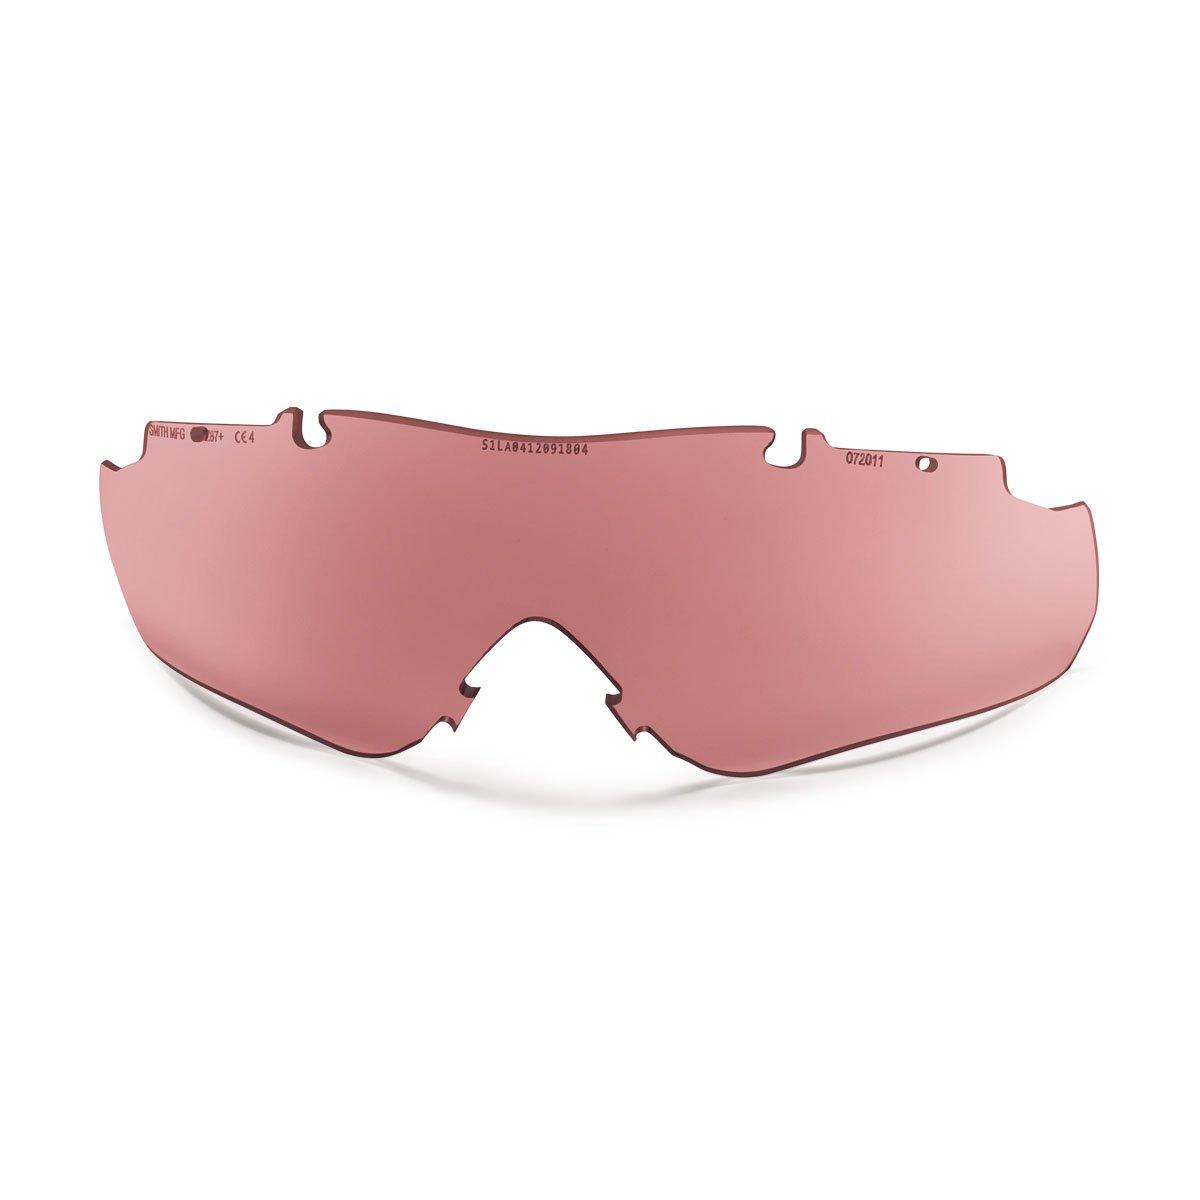 1495b0d31b Amazon.com  smith optics elite aegis arc compact eyeshield replacement  lens  Sports   Outdoors